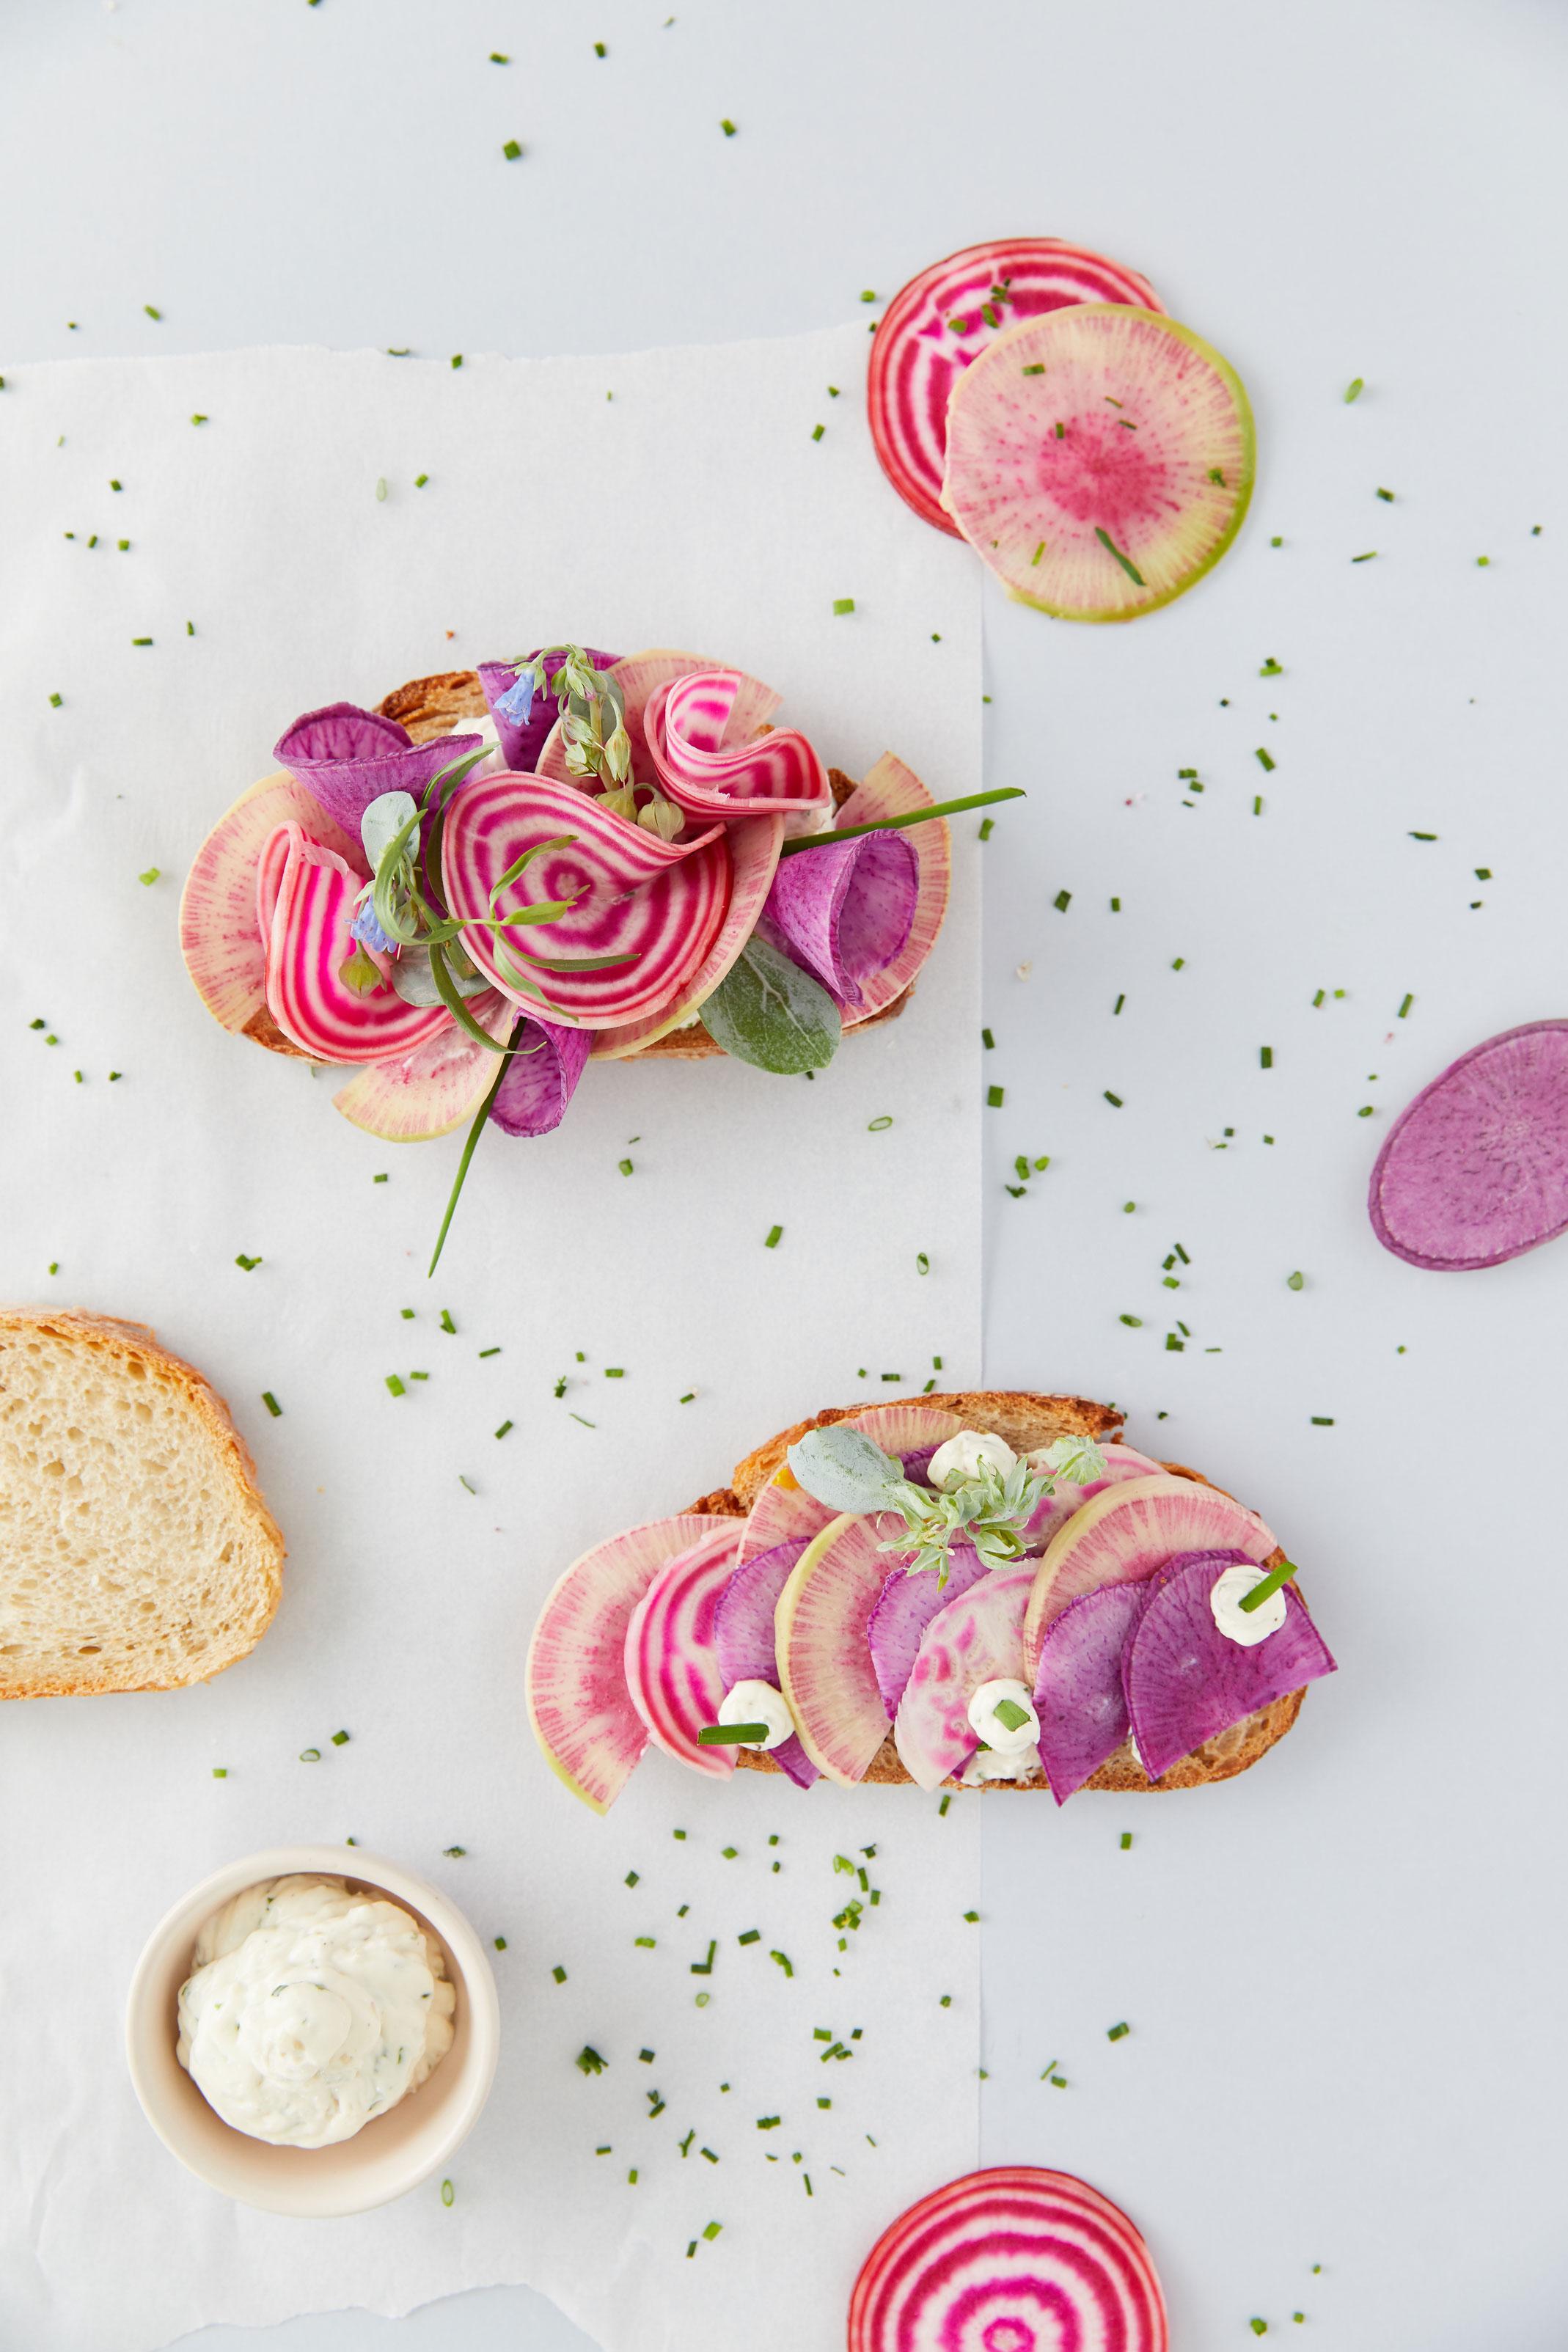 photographe culinaire studio rennes